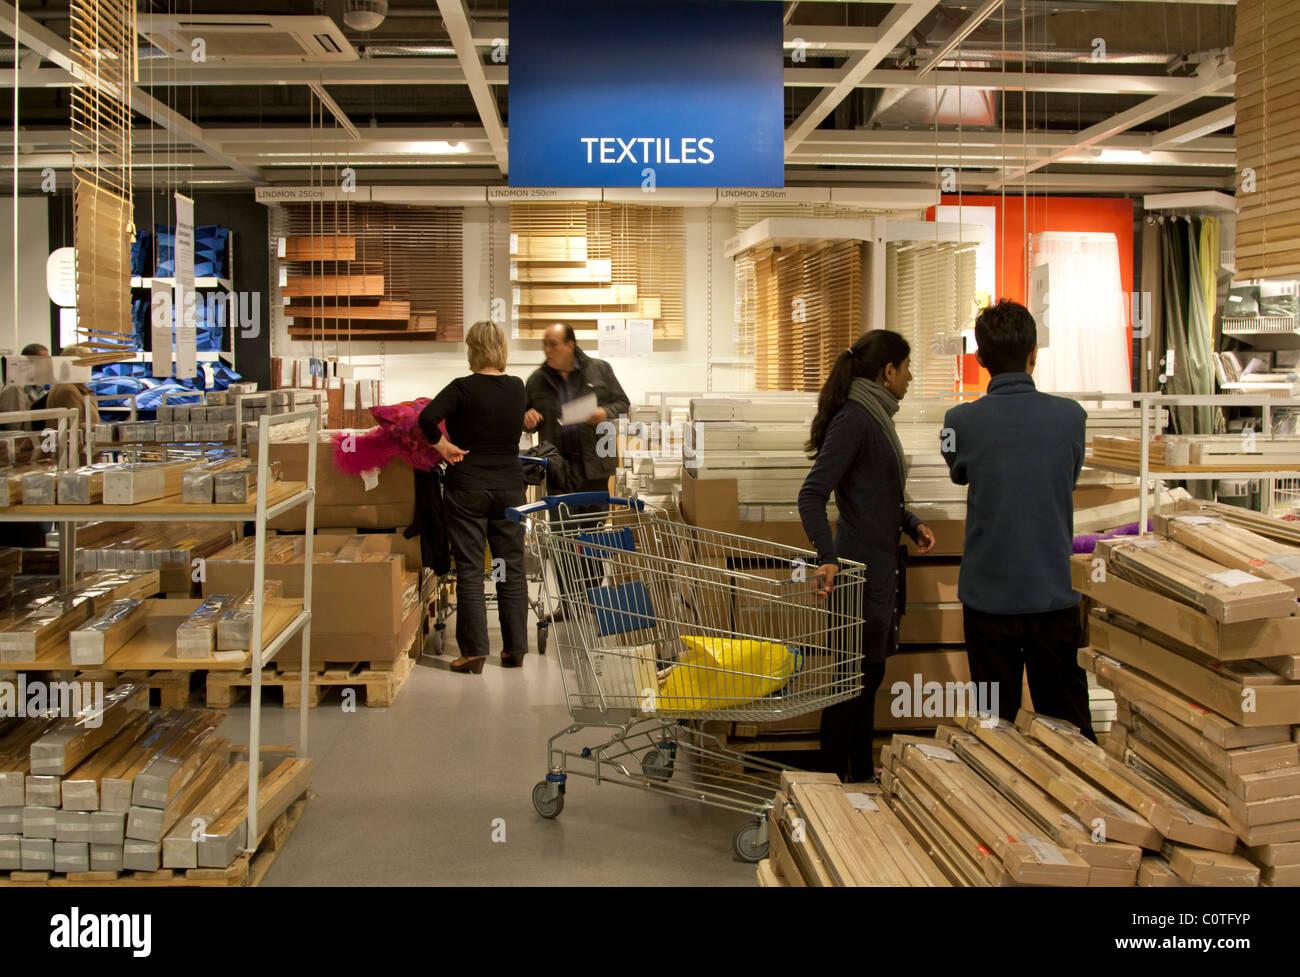 textile department ikea store wembley london stock. Black Bedroom Furniture Sets. Home Design Ideas